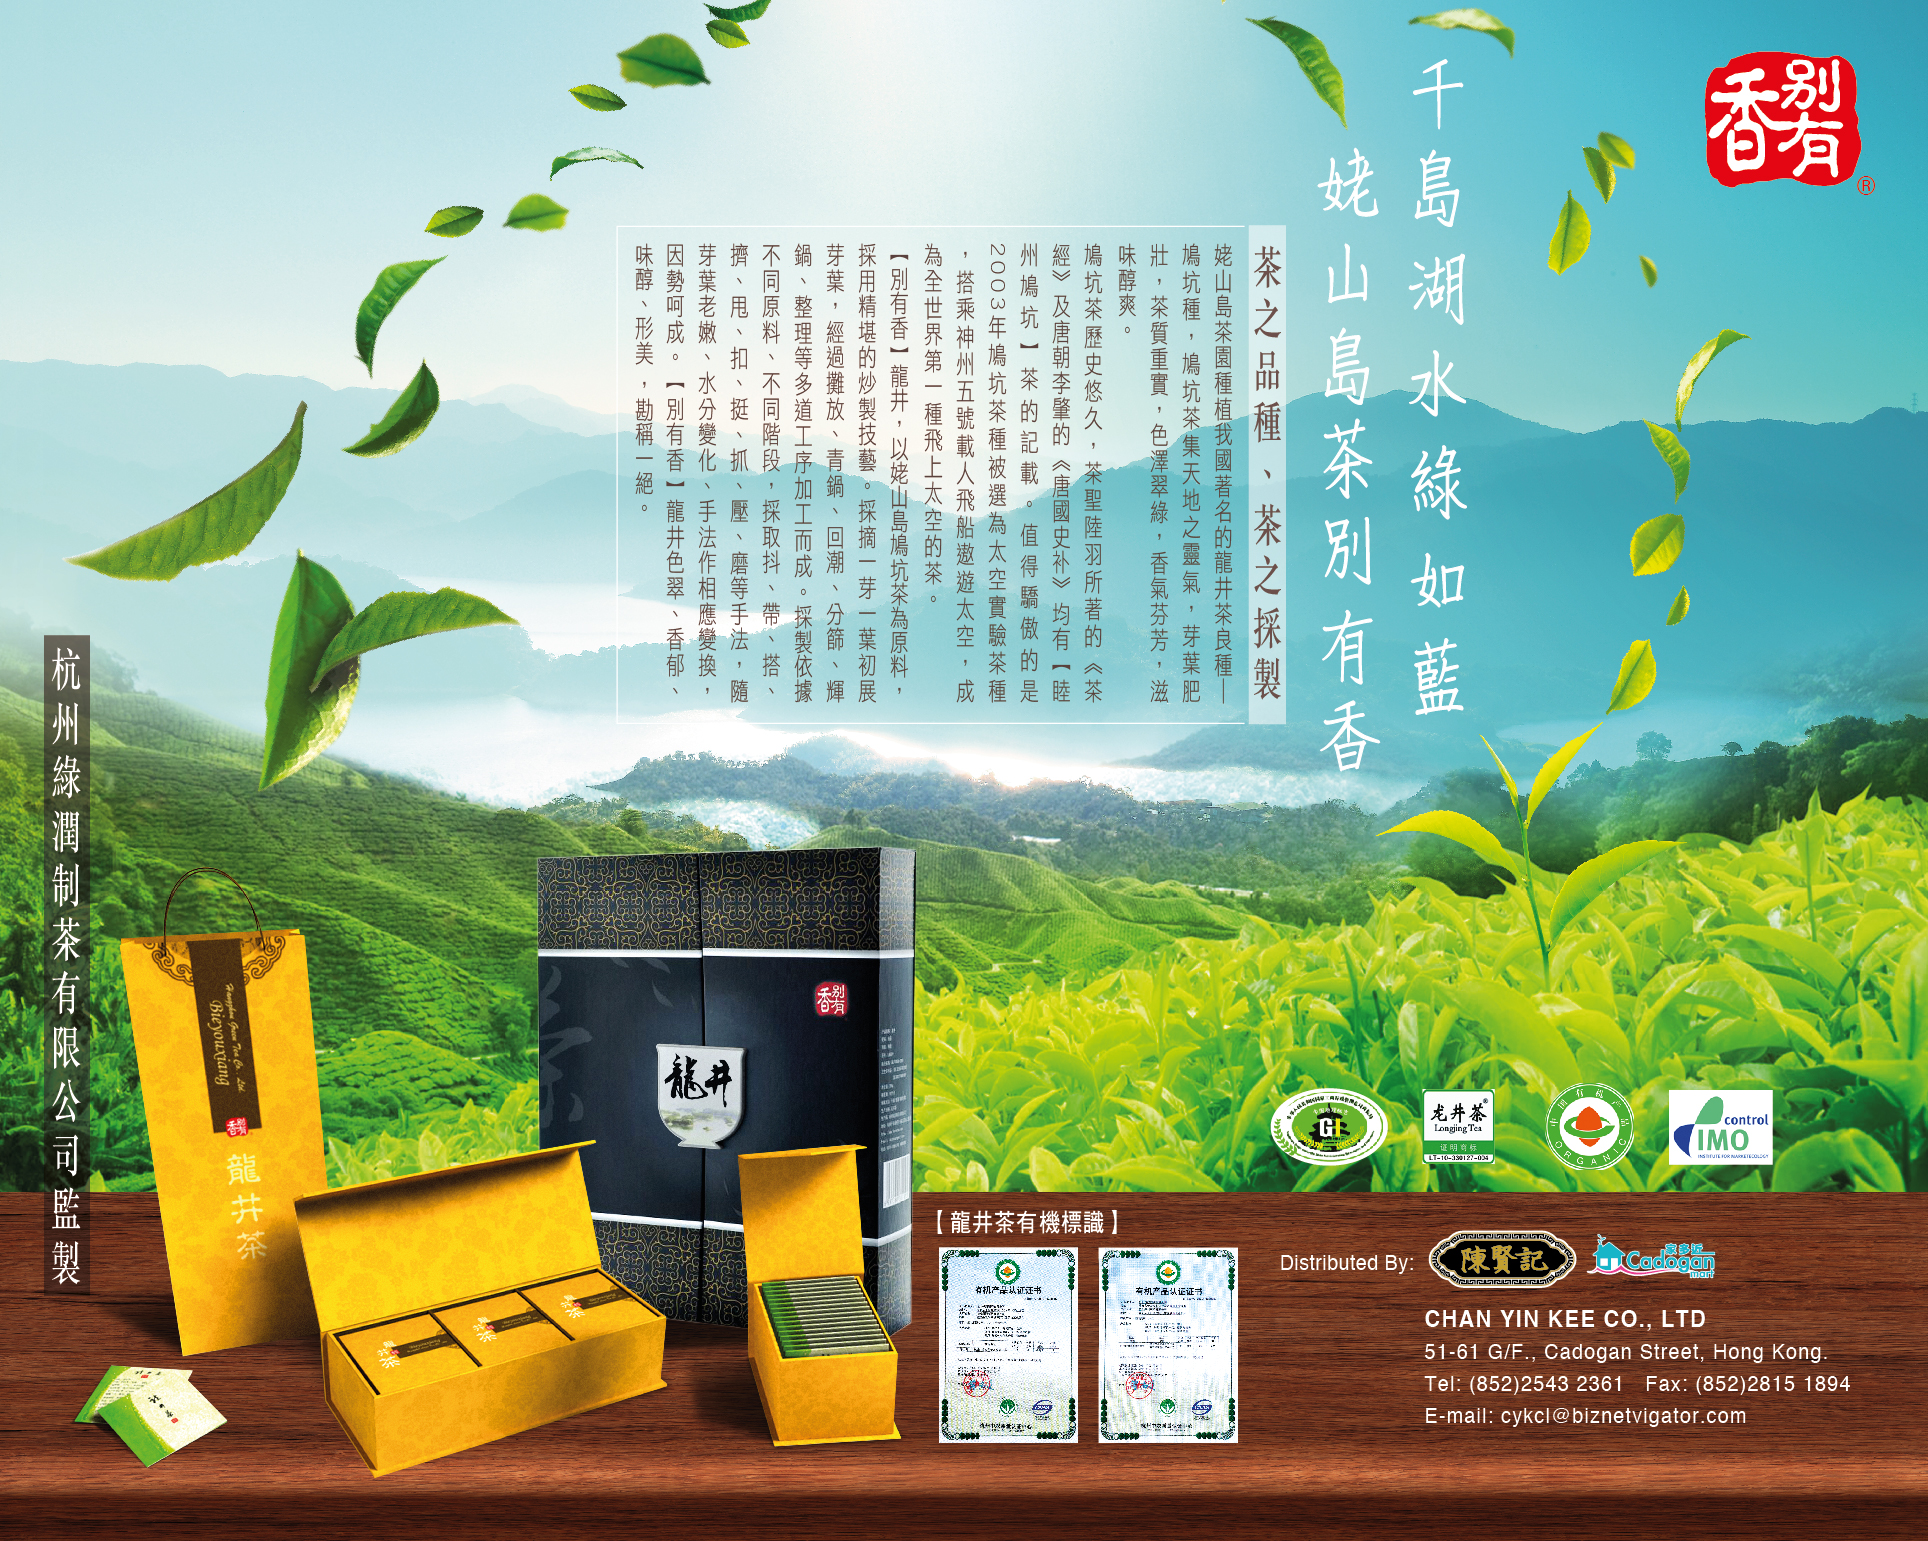 Chan Yiu Kee Limited